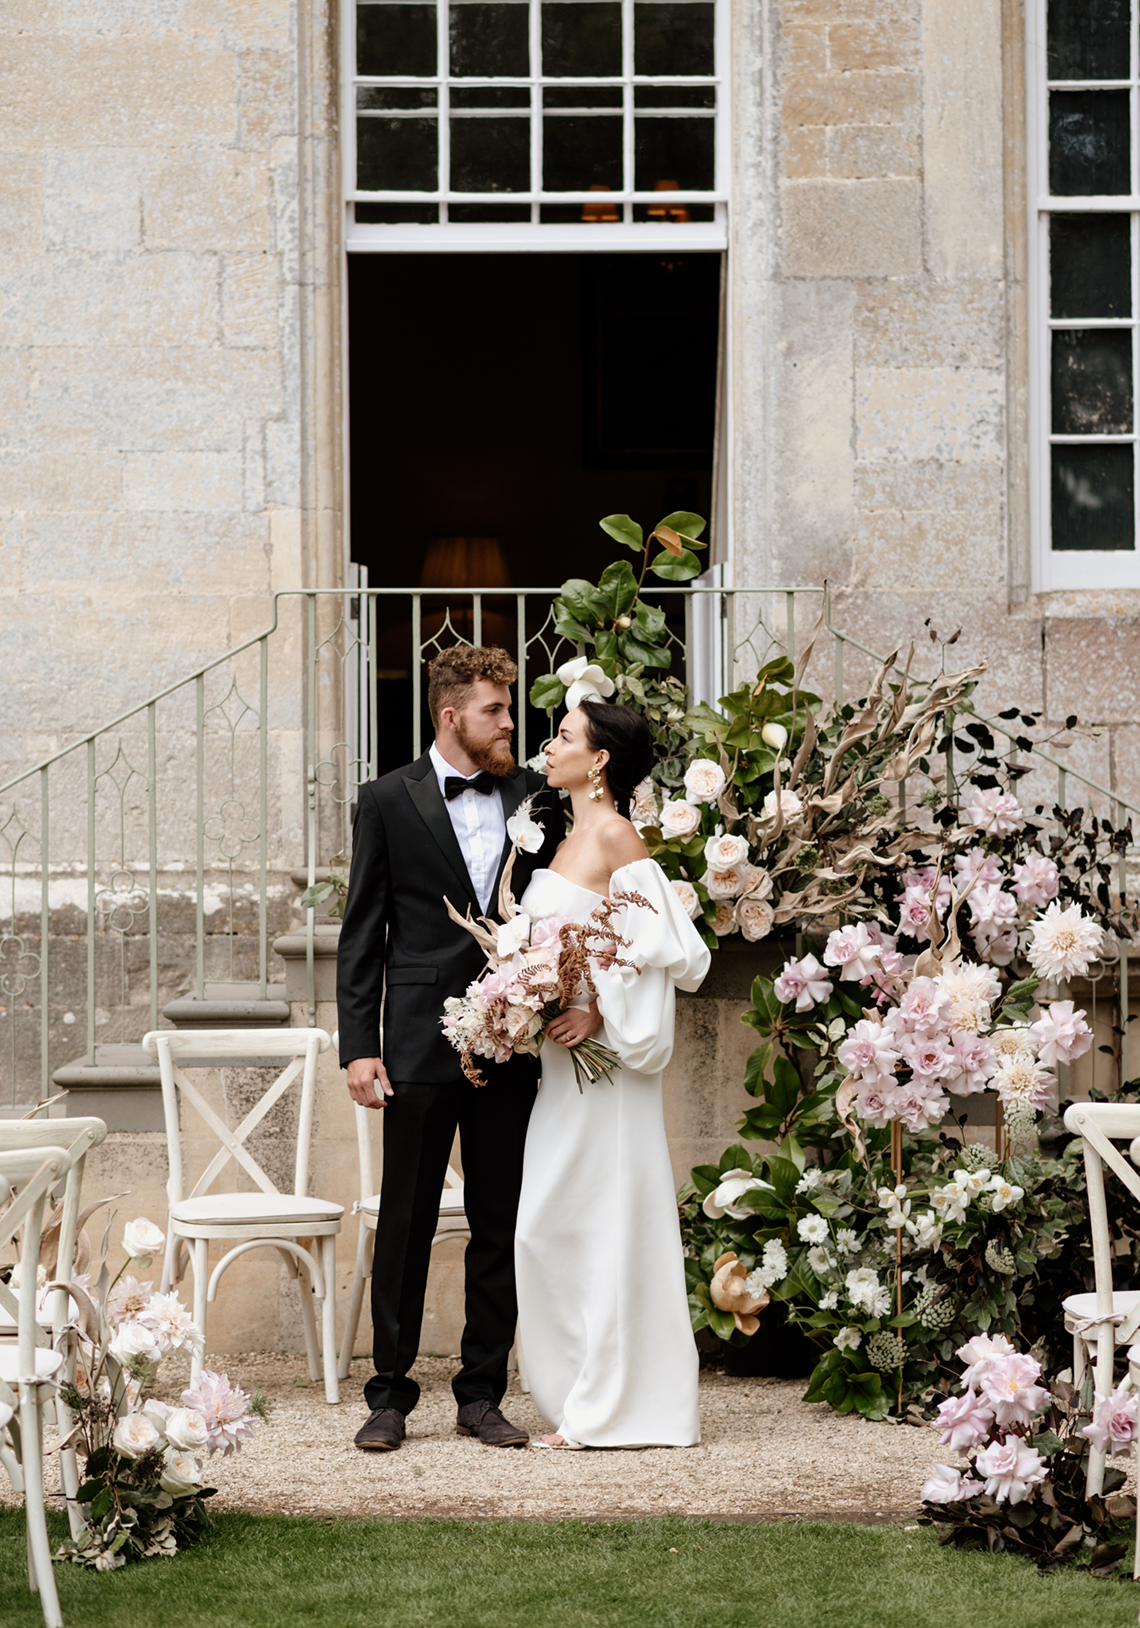 Fashion-forward Countryside Wedding Inspiration – Elmore Court – Laura Martha Photography 21